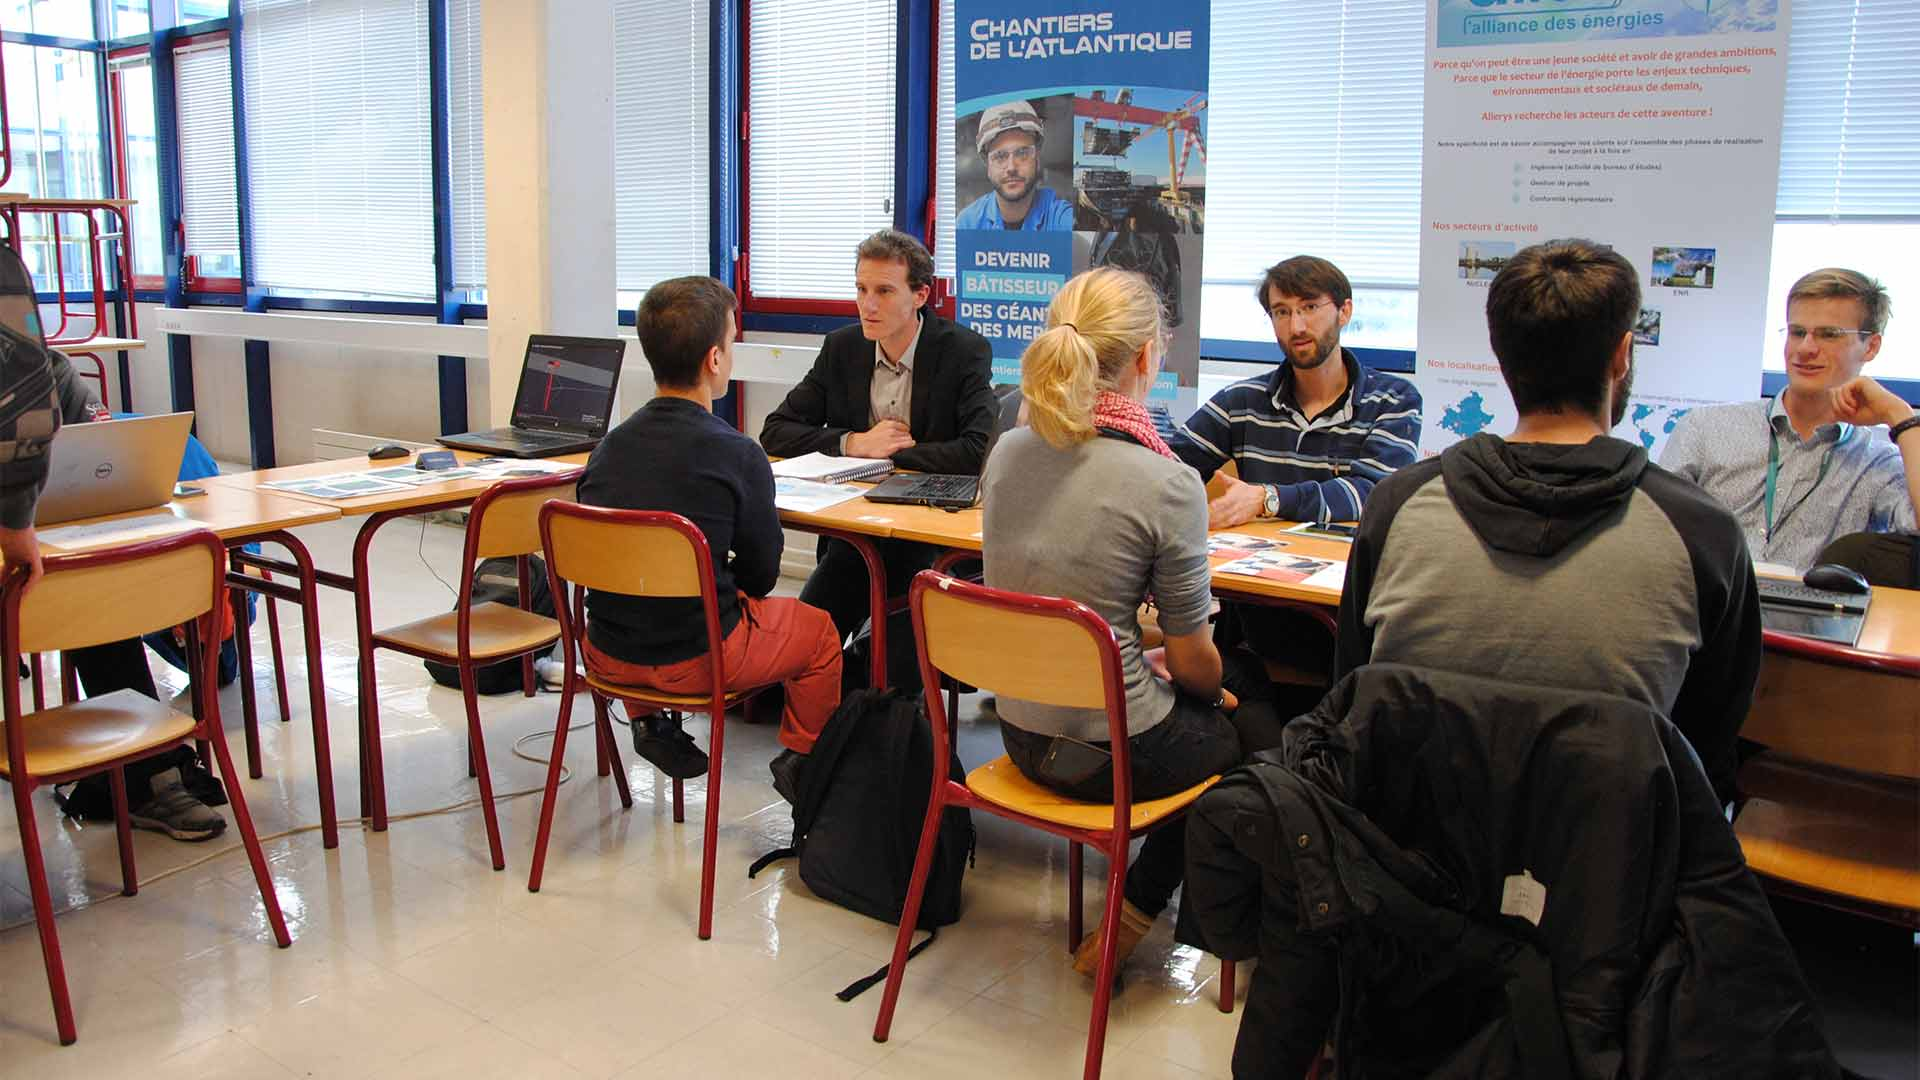 Student-Alumni Forum: bringing students and graduates together